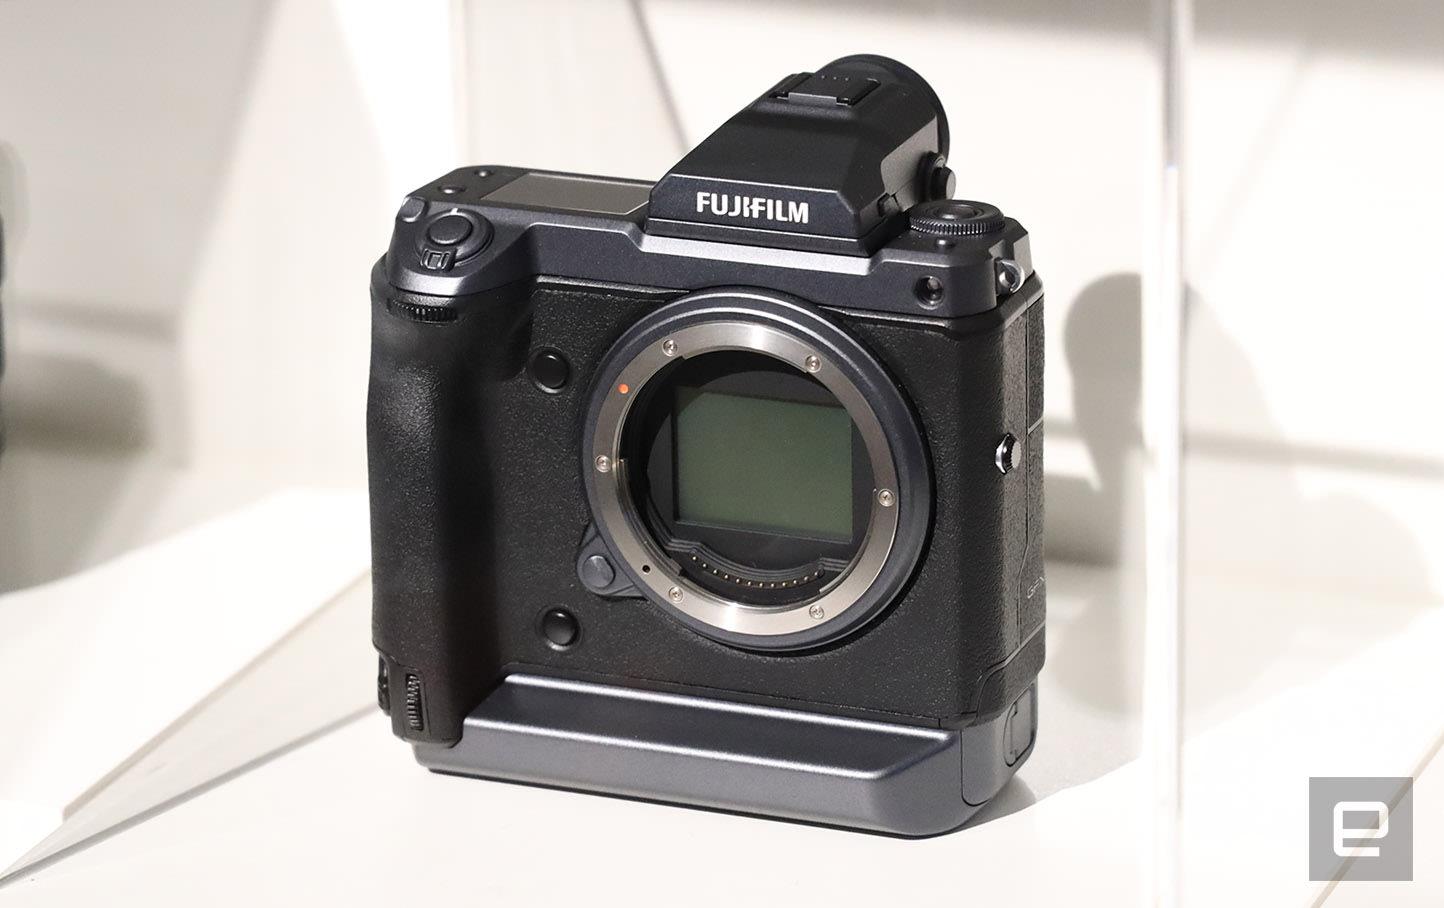 Fujifilm shows off an insane 100-megapixel medium format camera